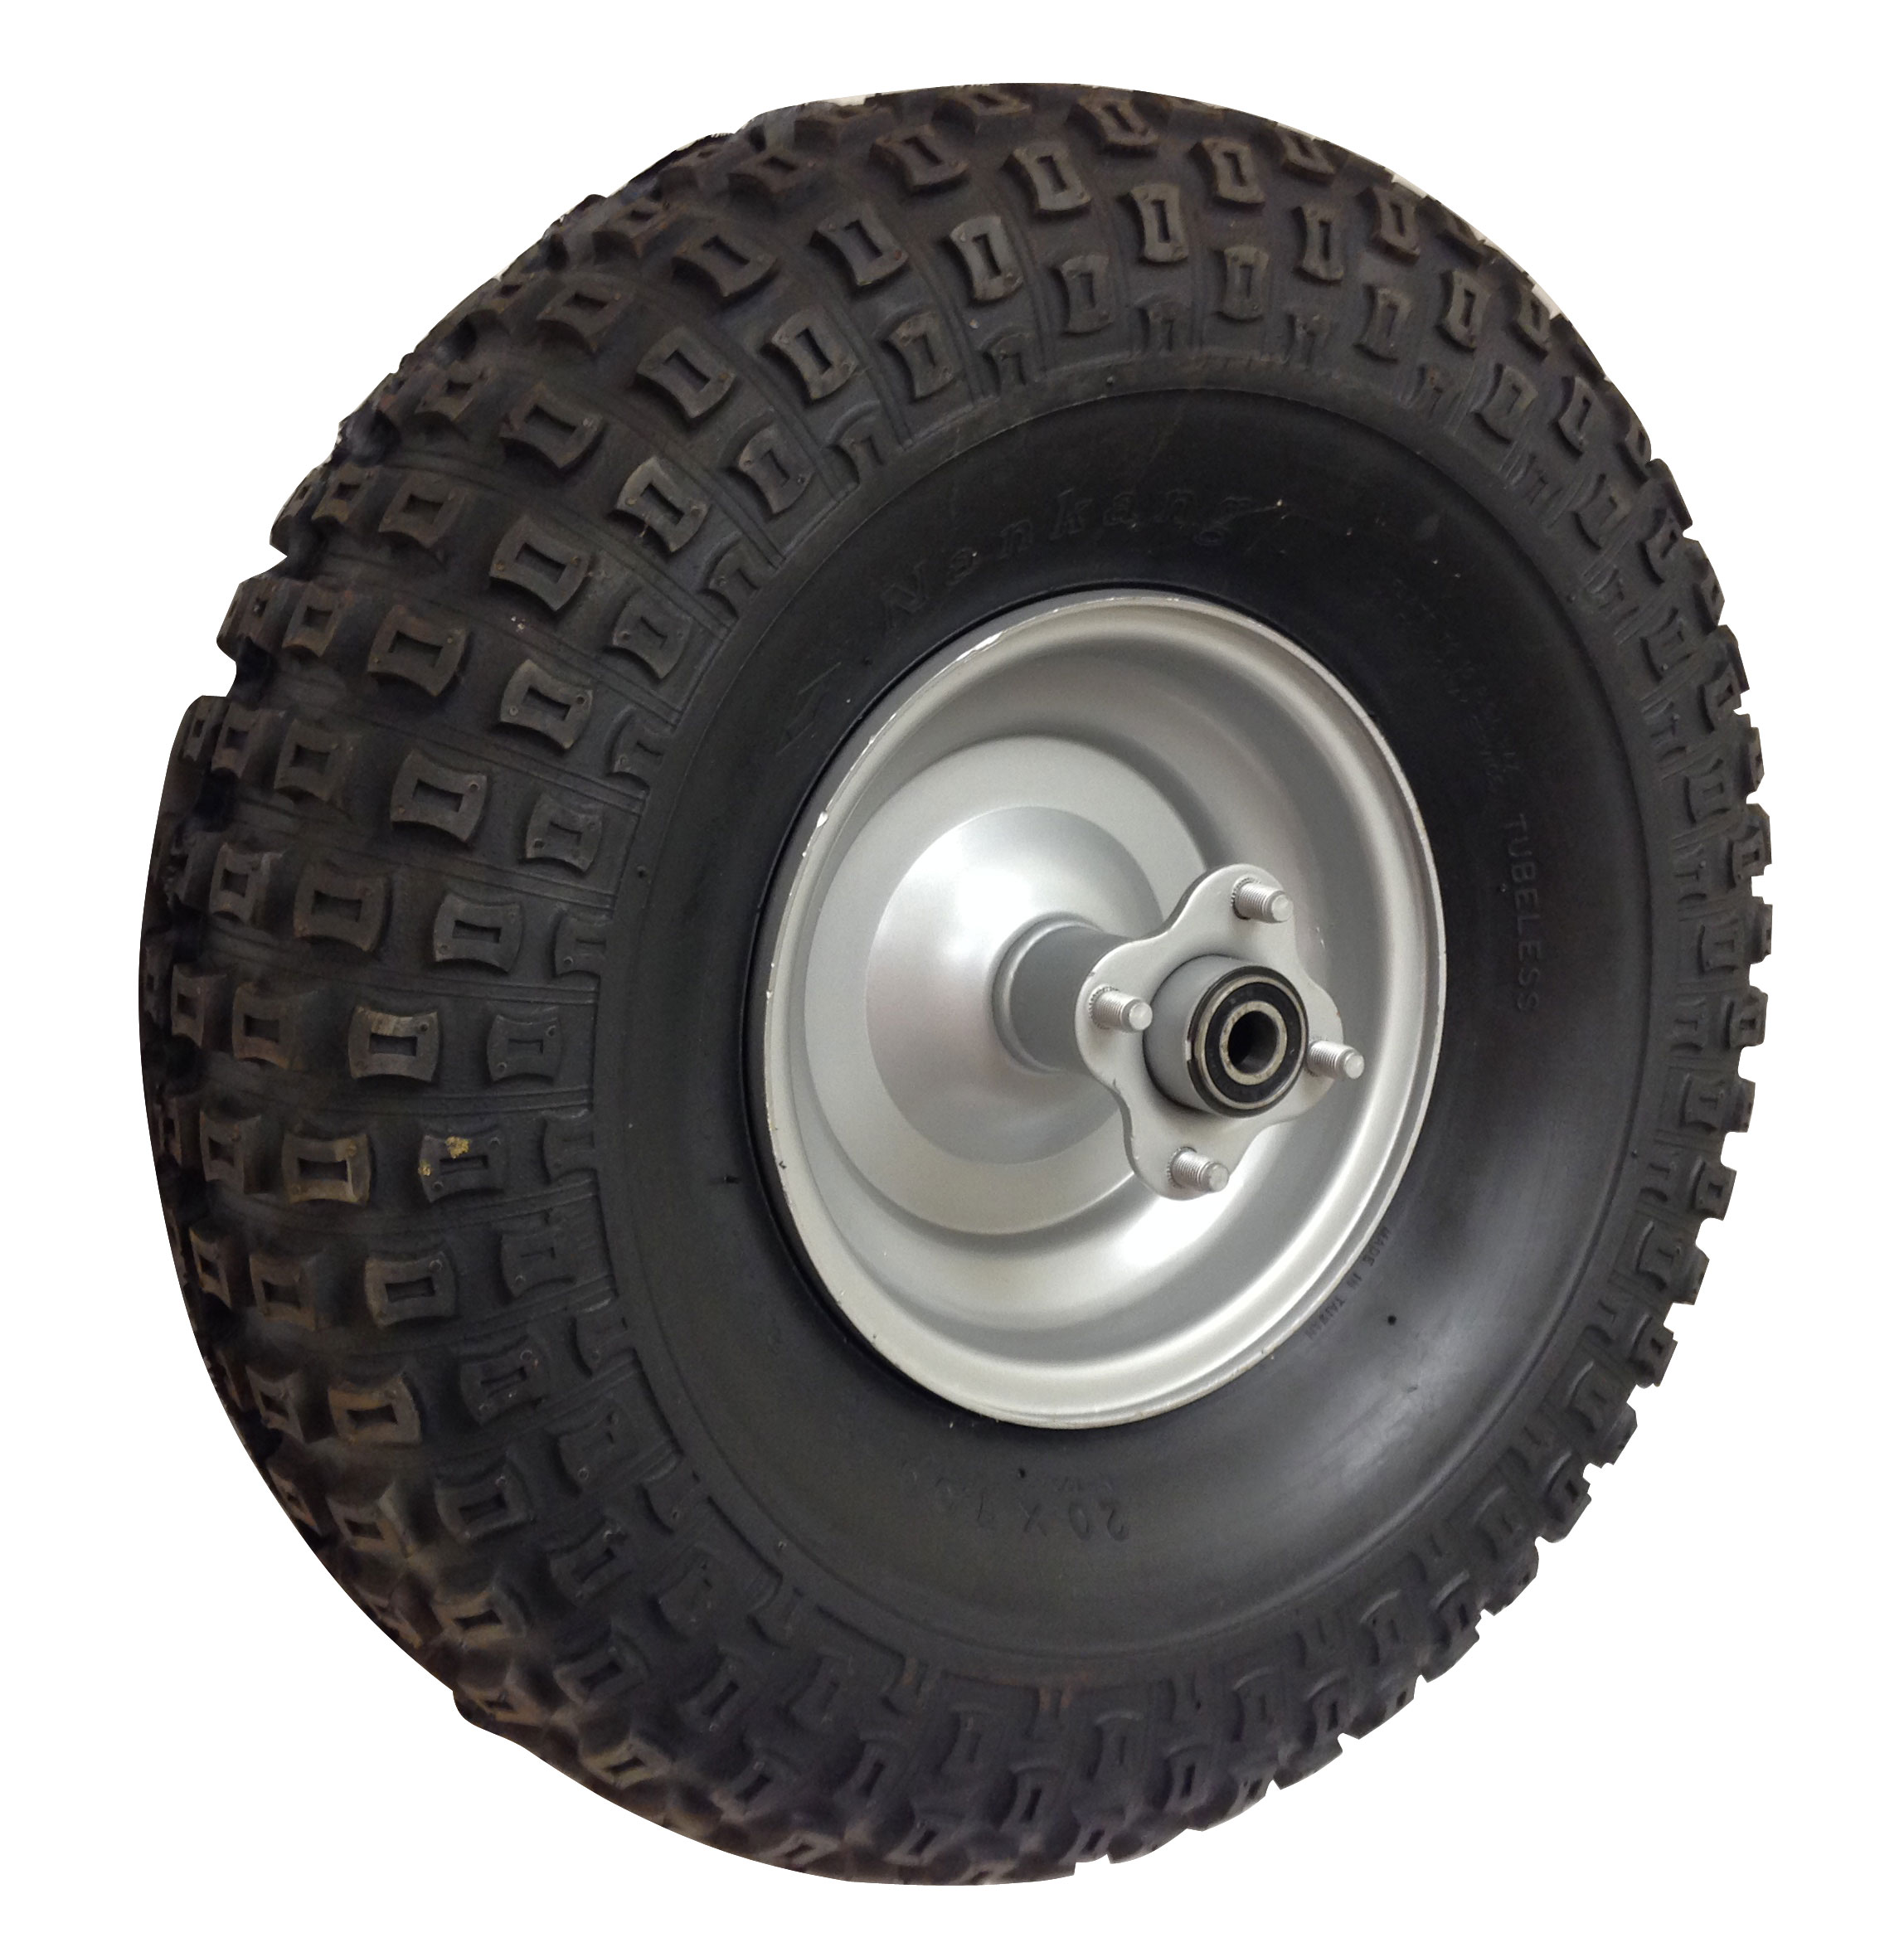 Mini Bike With Atv Tires : Knobby tire with rim for mini bike rear